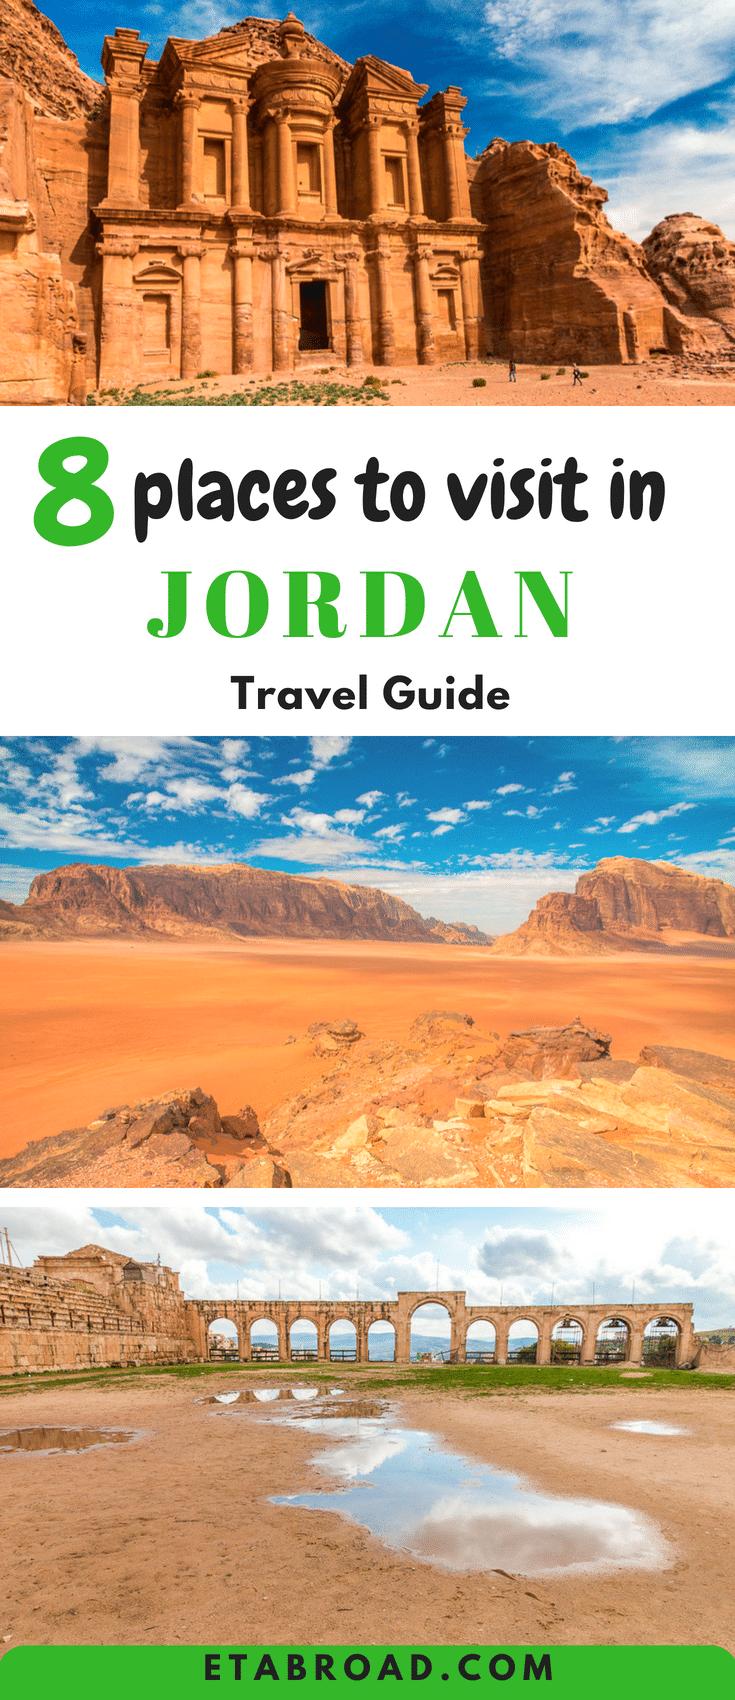 Jordan Travel Guide   What to see in Jordan   must-see places   Best things to see in Jordan   Jordan is not only Petra   Ancient places in Jordan   Best Places to Visit in Jordan